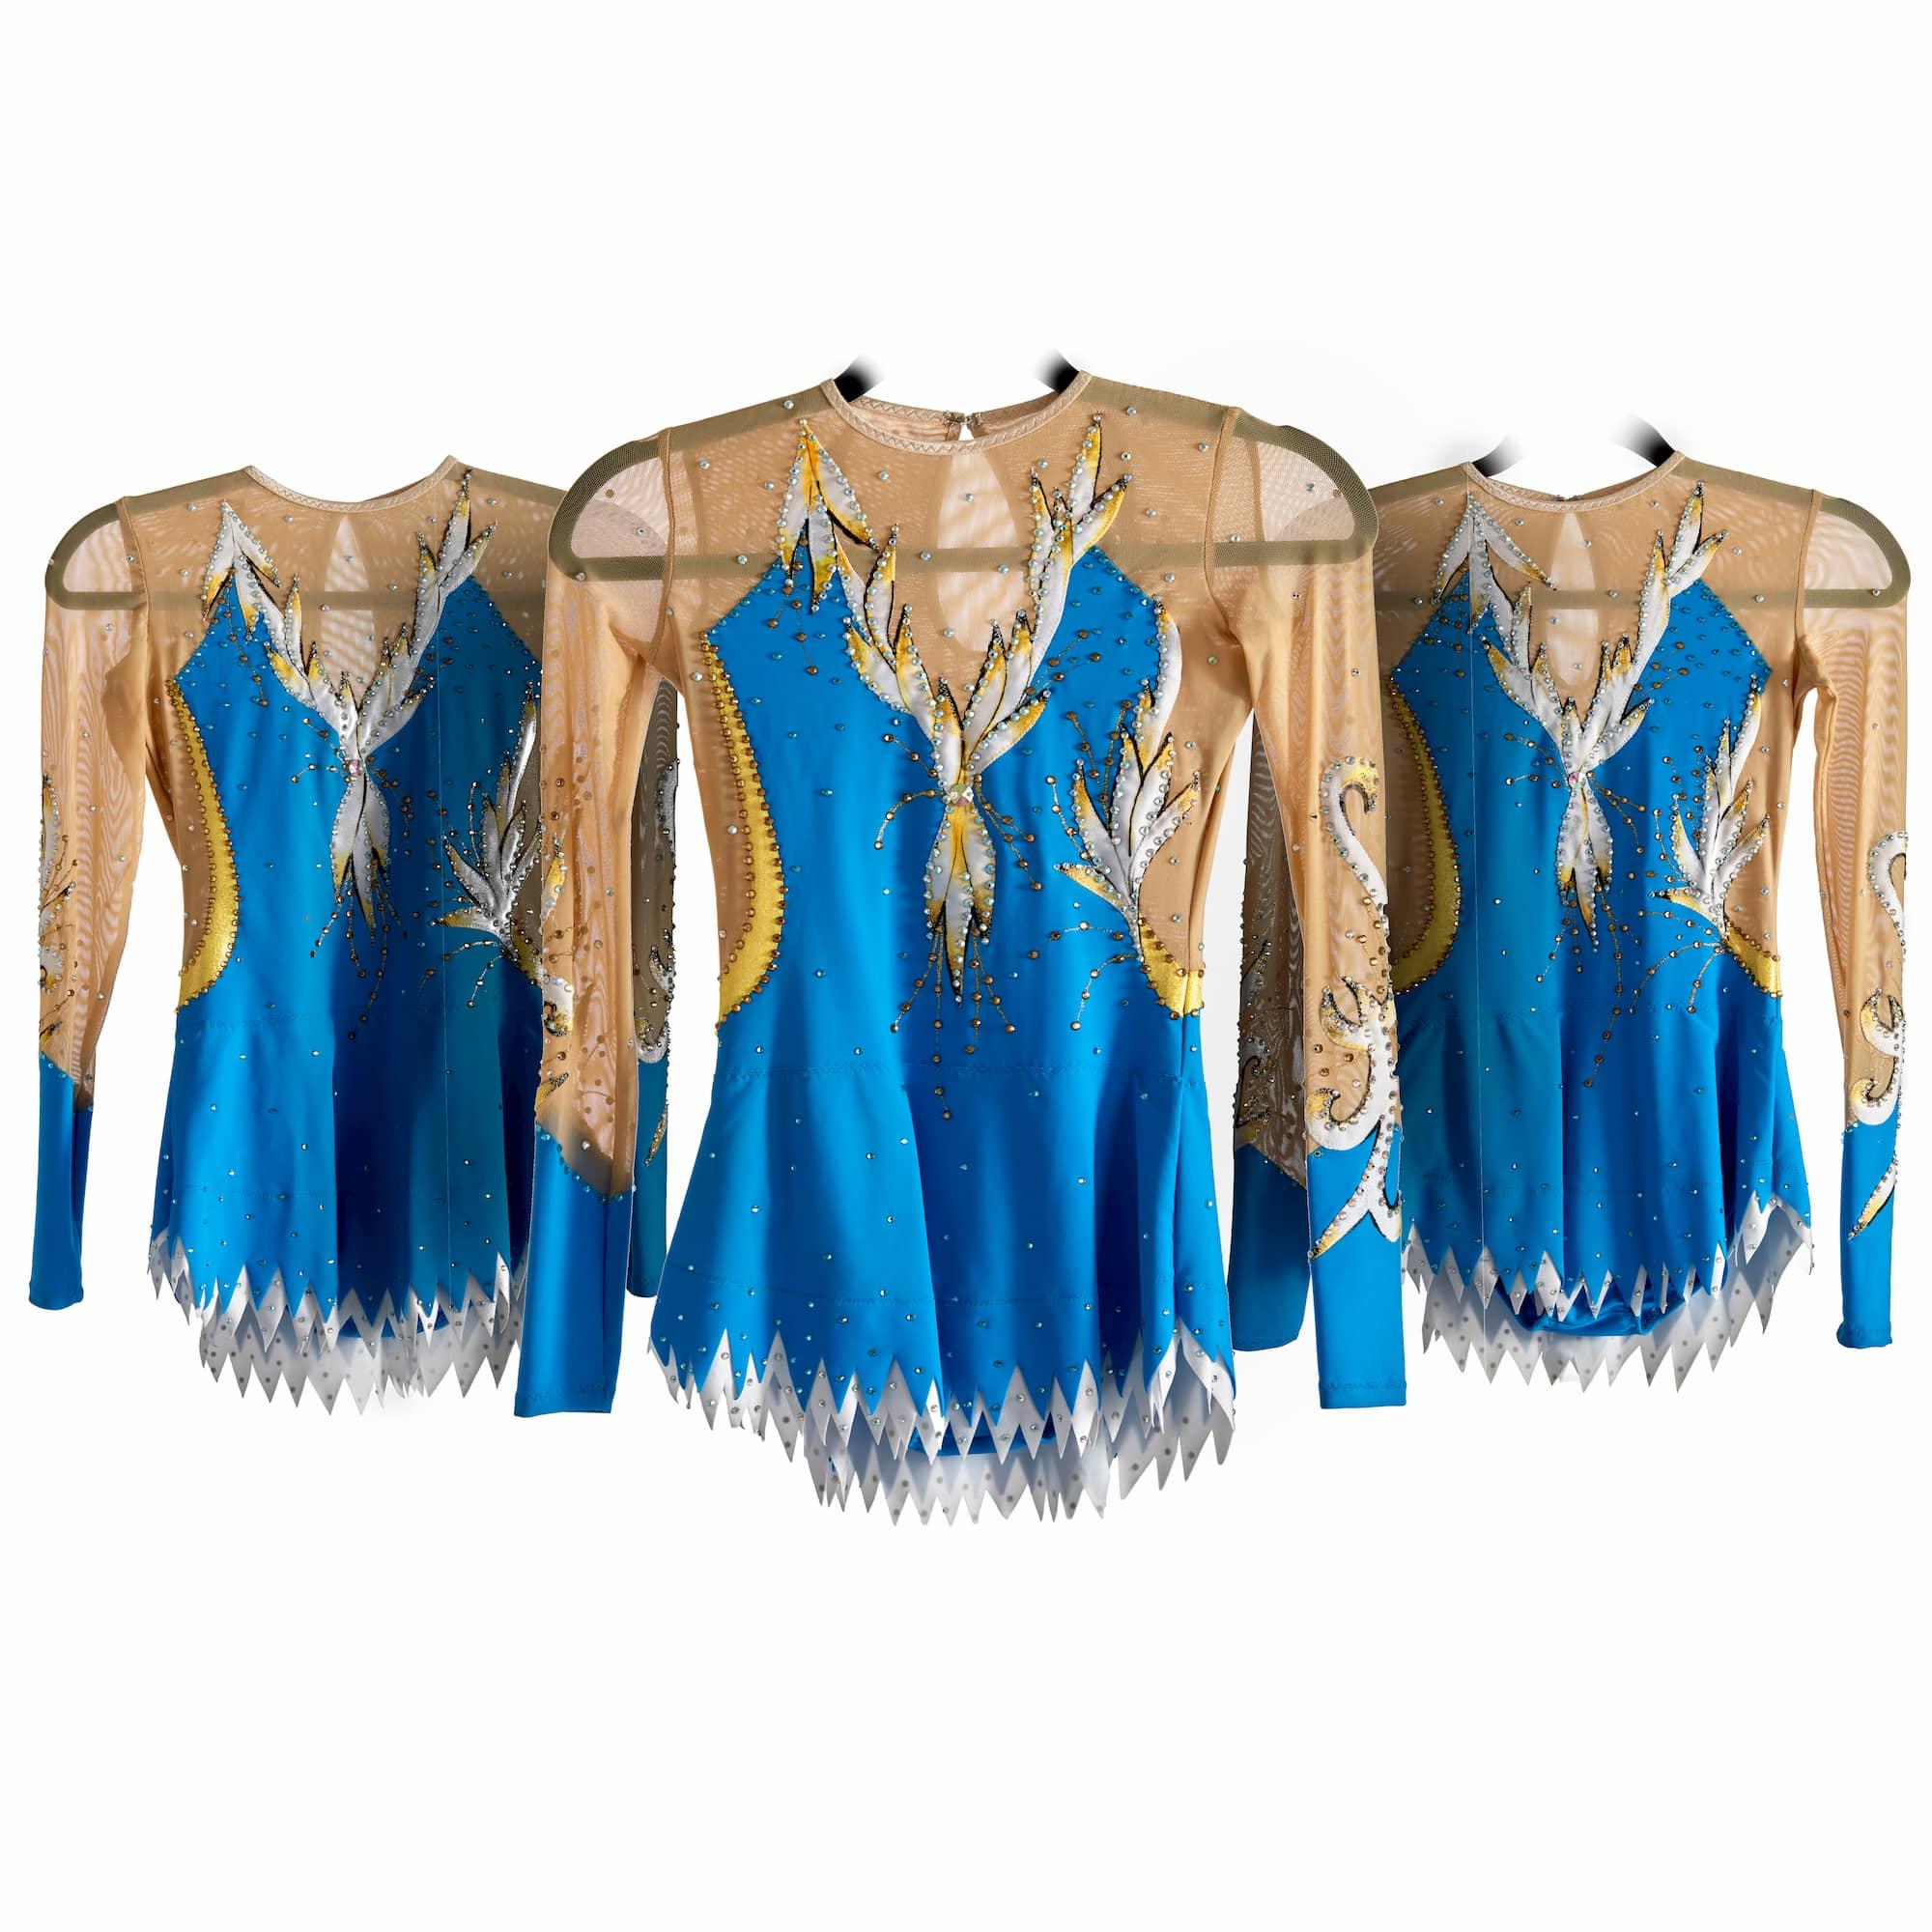 Stock Trio leotards № 236 for rhythmic gymnastics